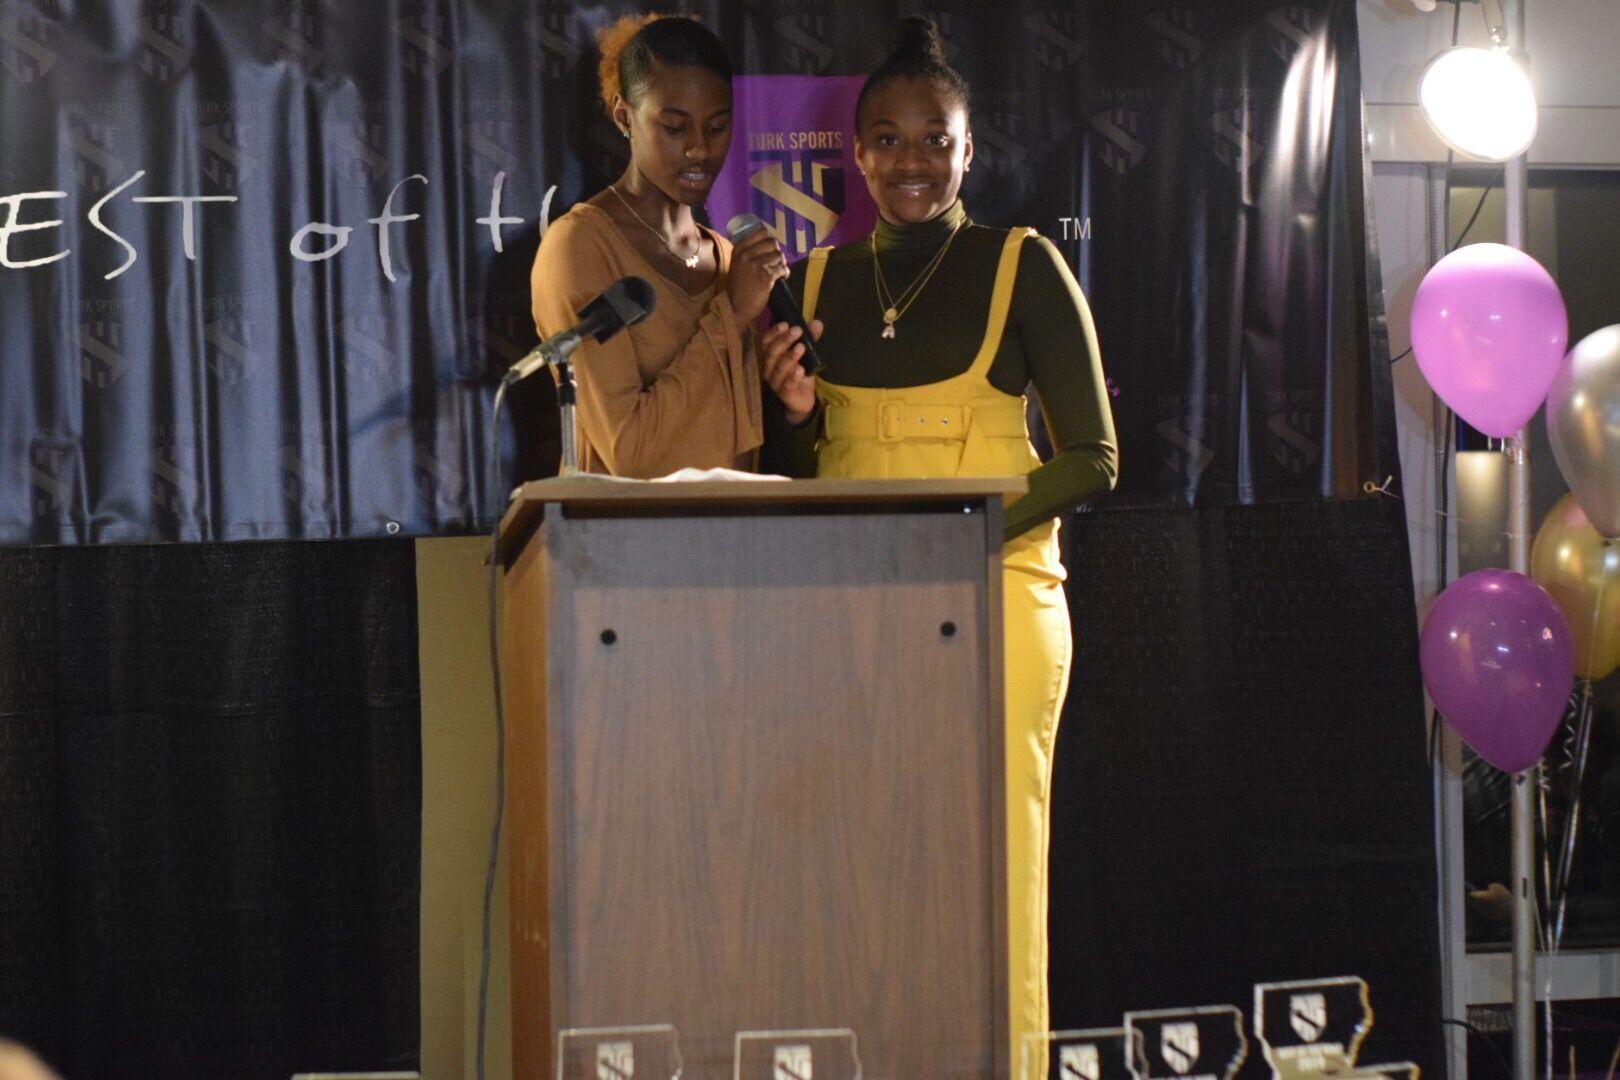 Aaliah Clark & Alana Richardson present the award for Best Athlete Softball